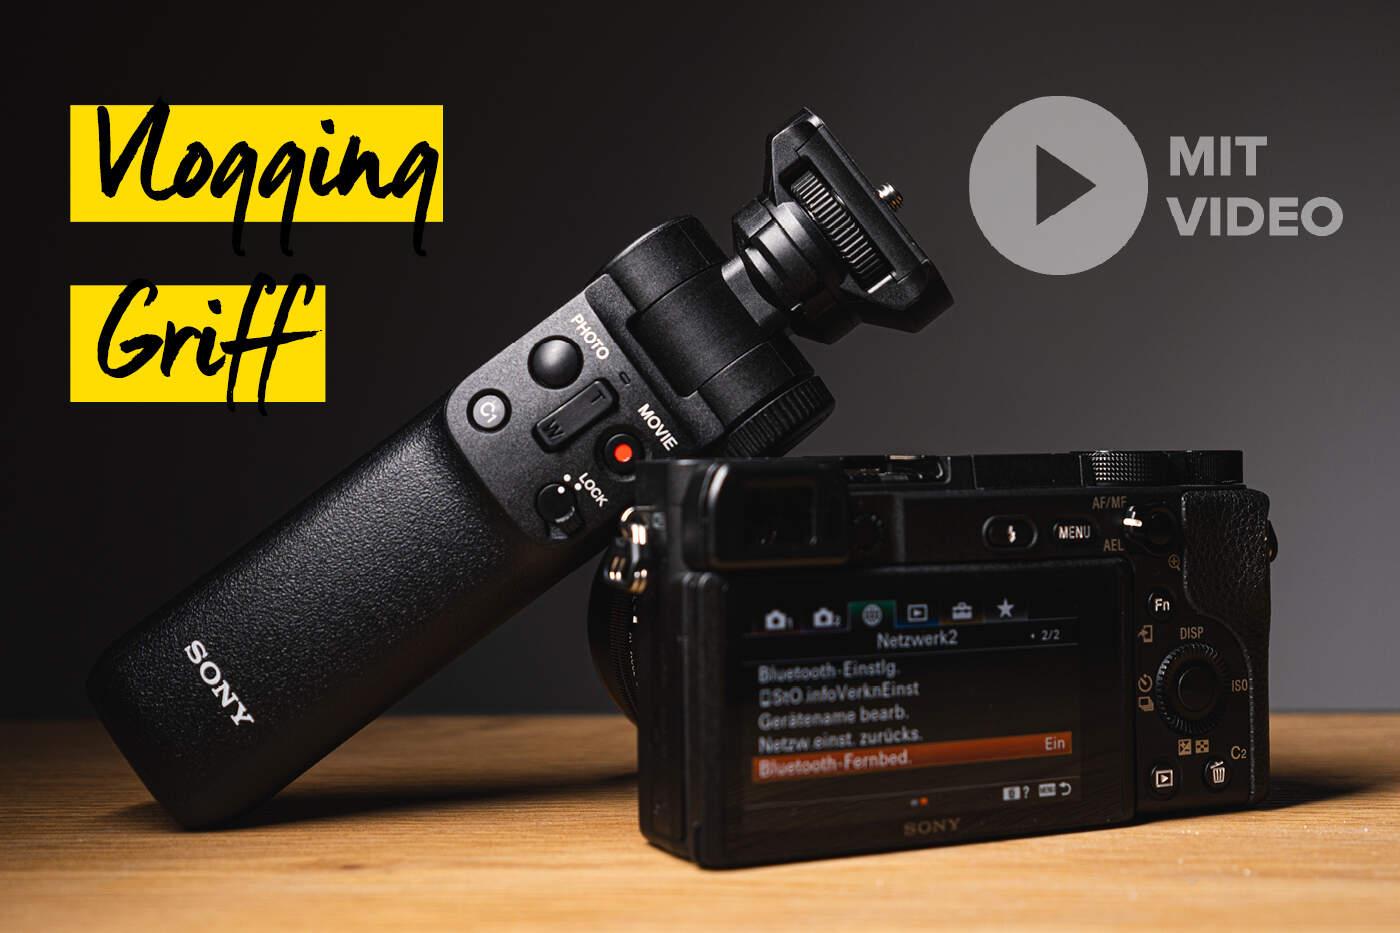 Sony Neuheit - Bluetooth Vlogging Griff